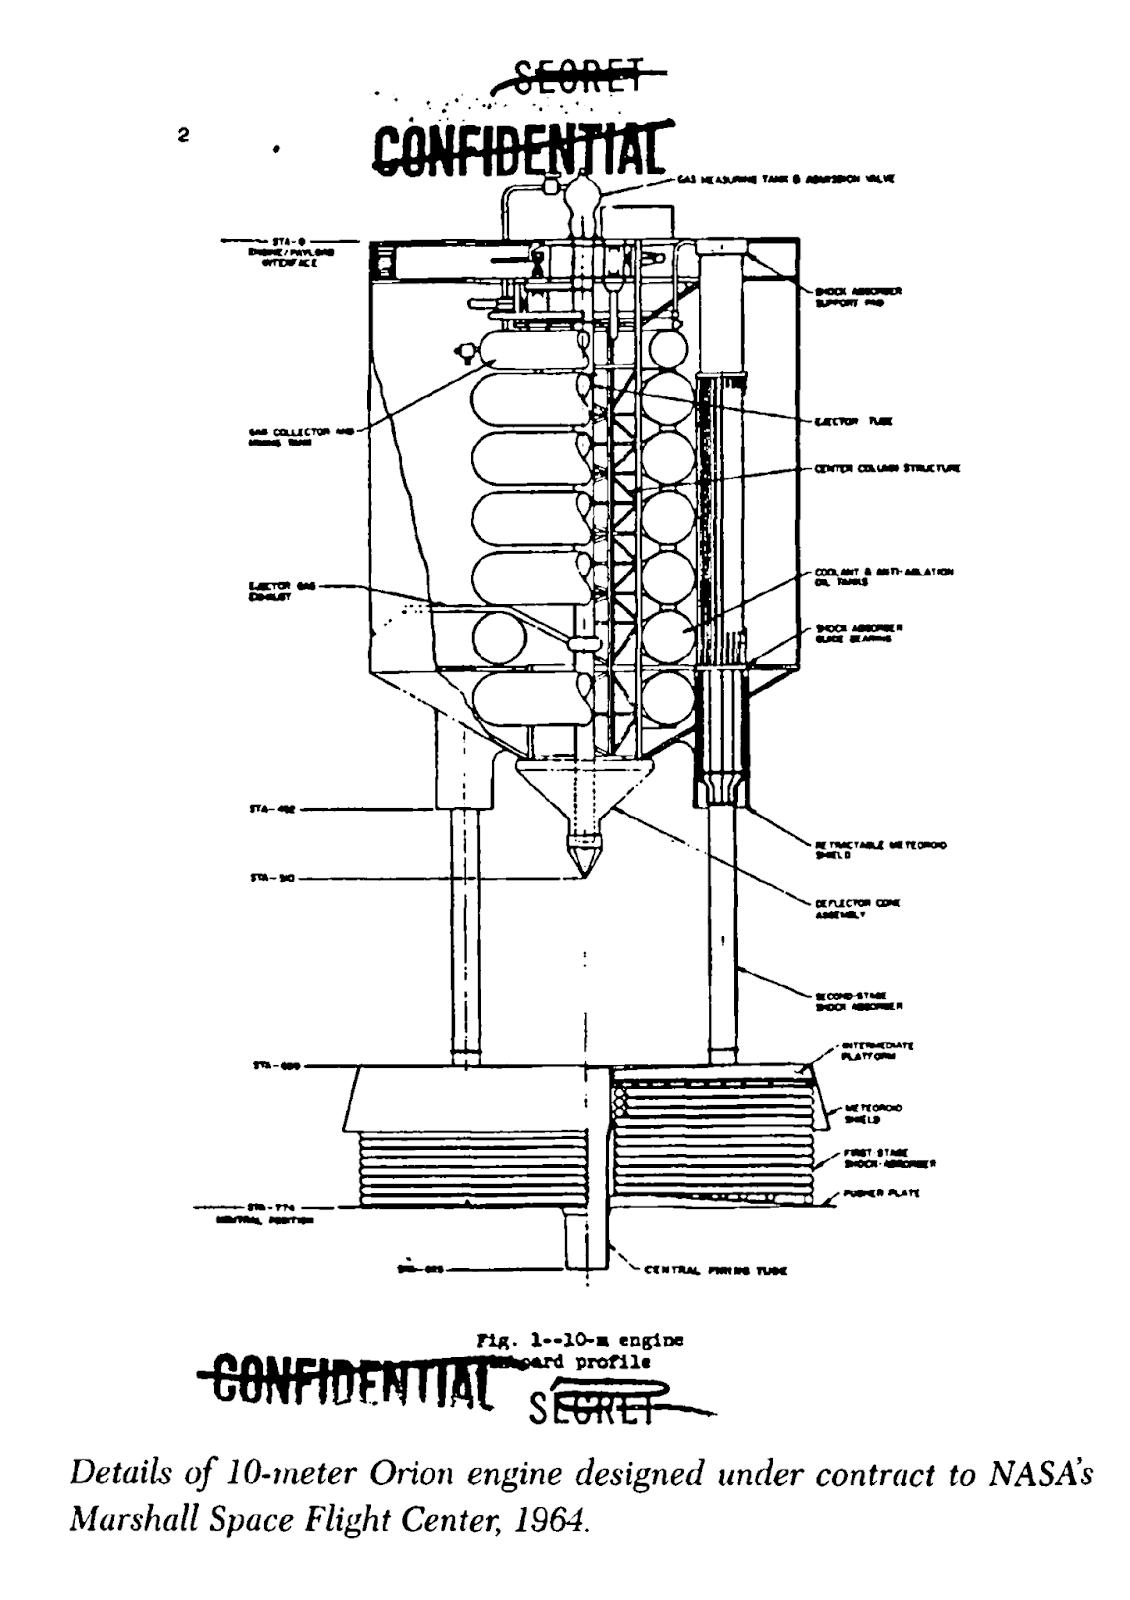 Area 51 Is The Home Of Americas Nuclear Aero Space Program Pheobus Engine Diagram Atomic Energy Commission 1961 Aspen An Aerospace Plane With Engines Los Alamos University California P10